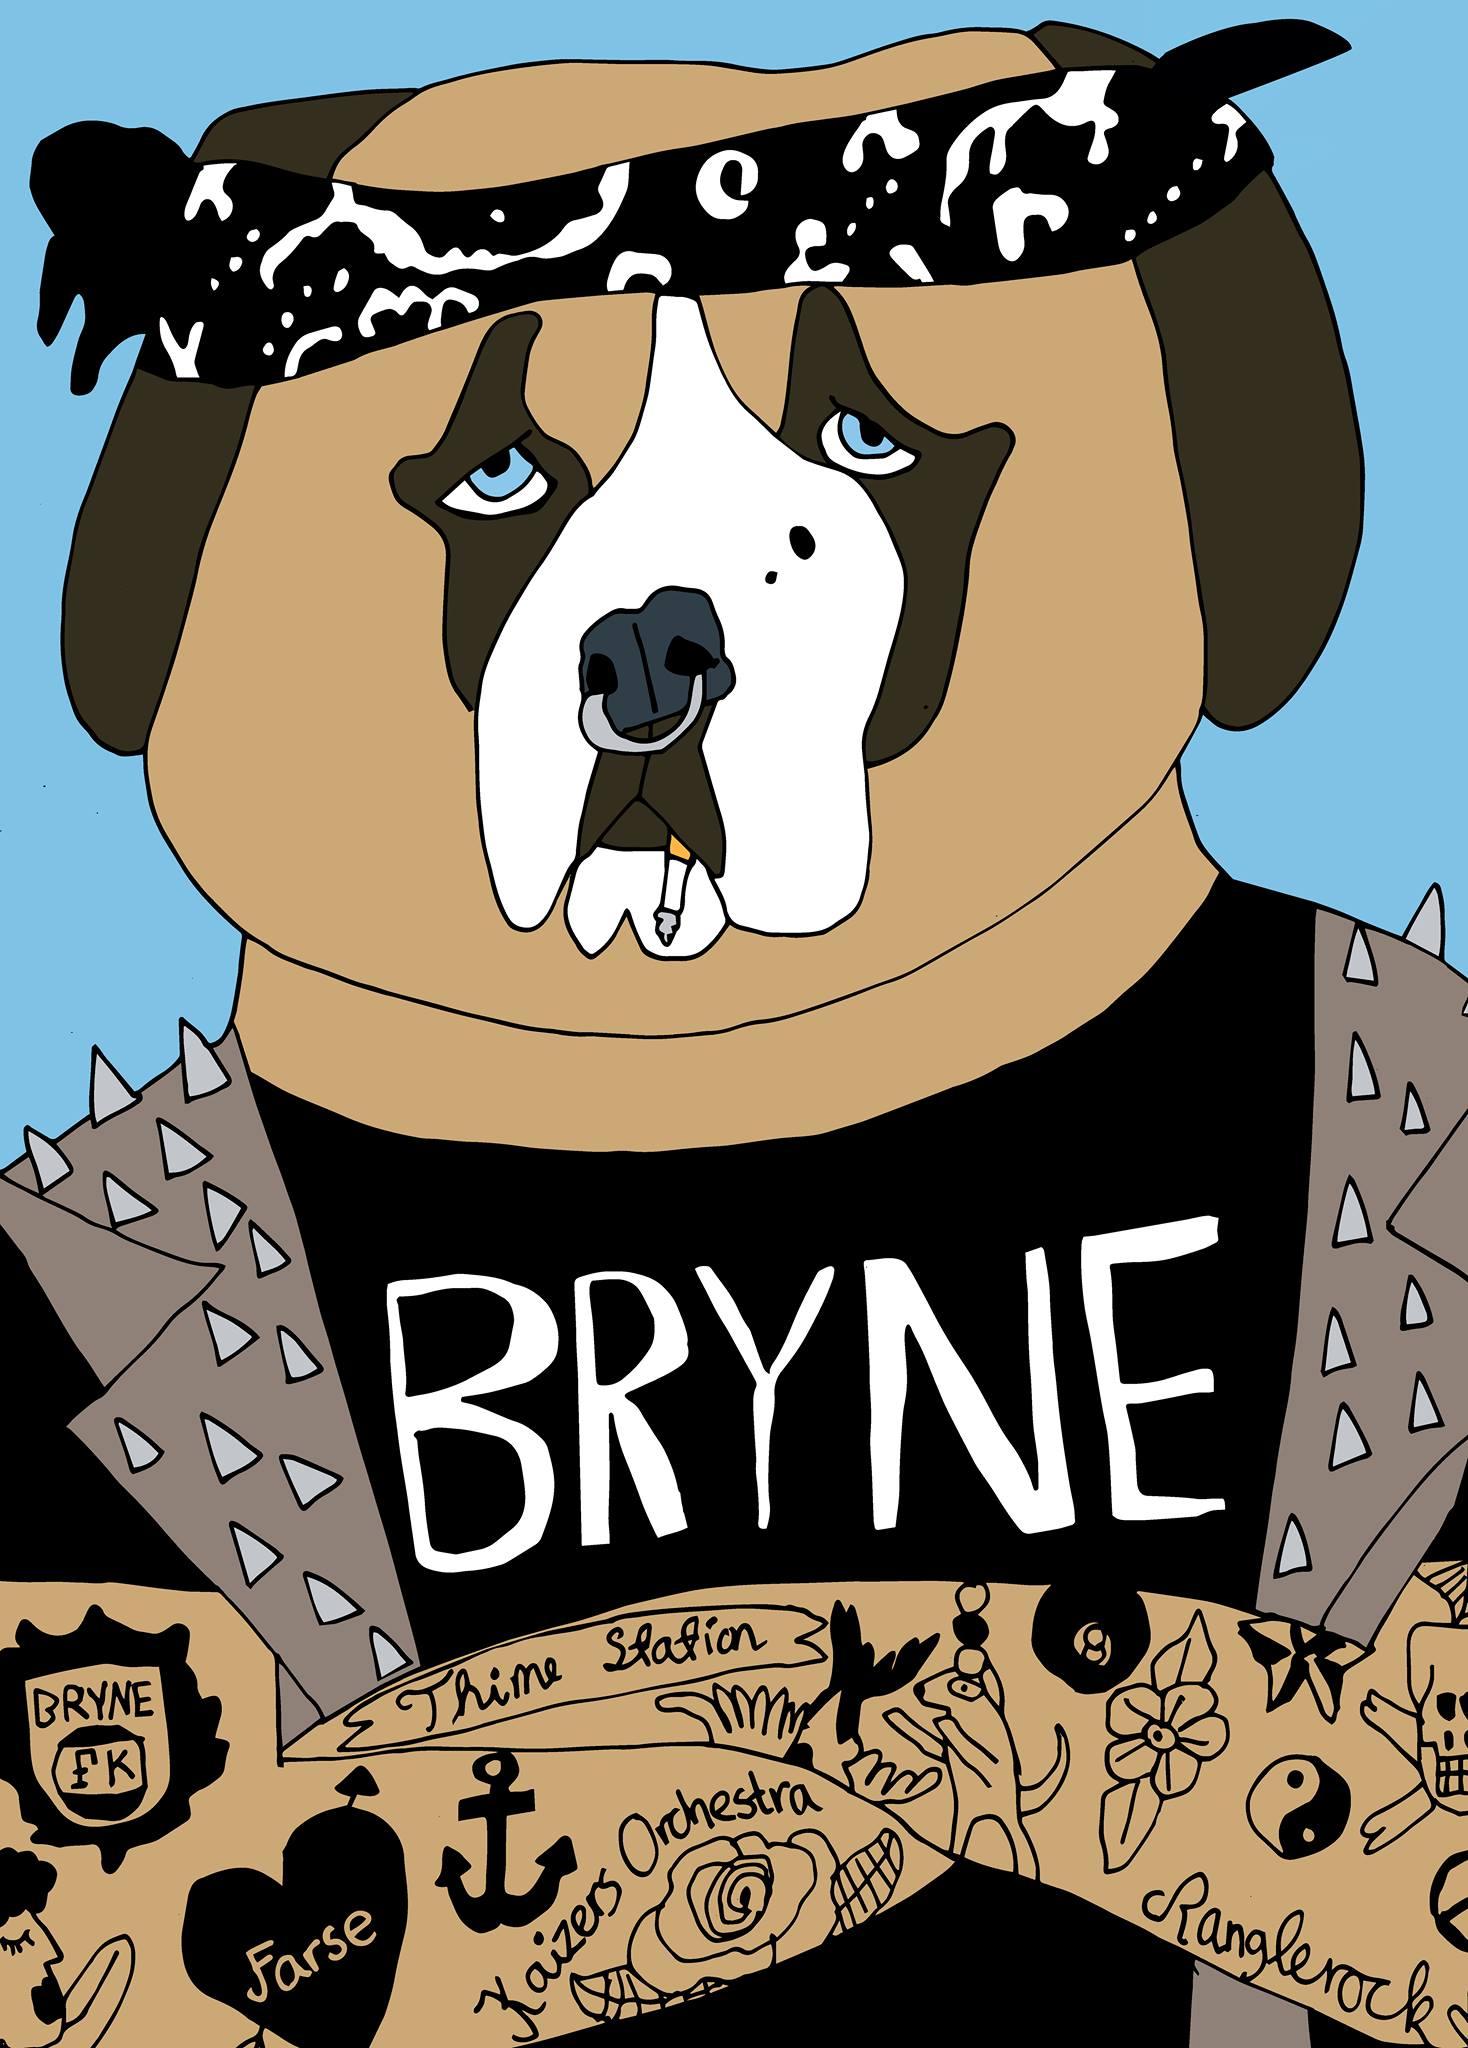 Bryne / 2015